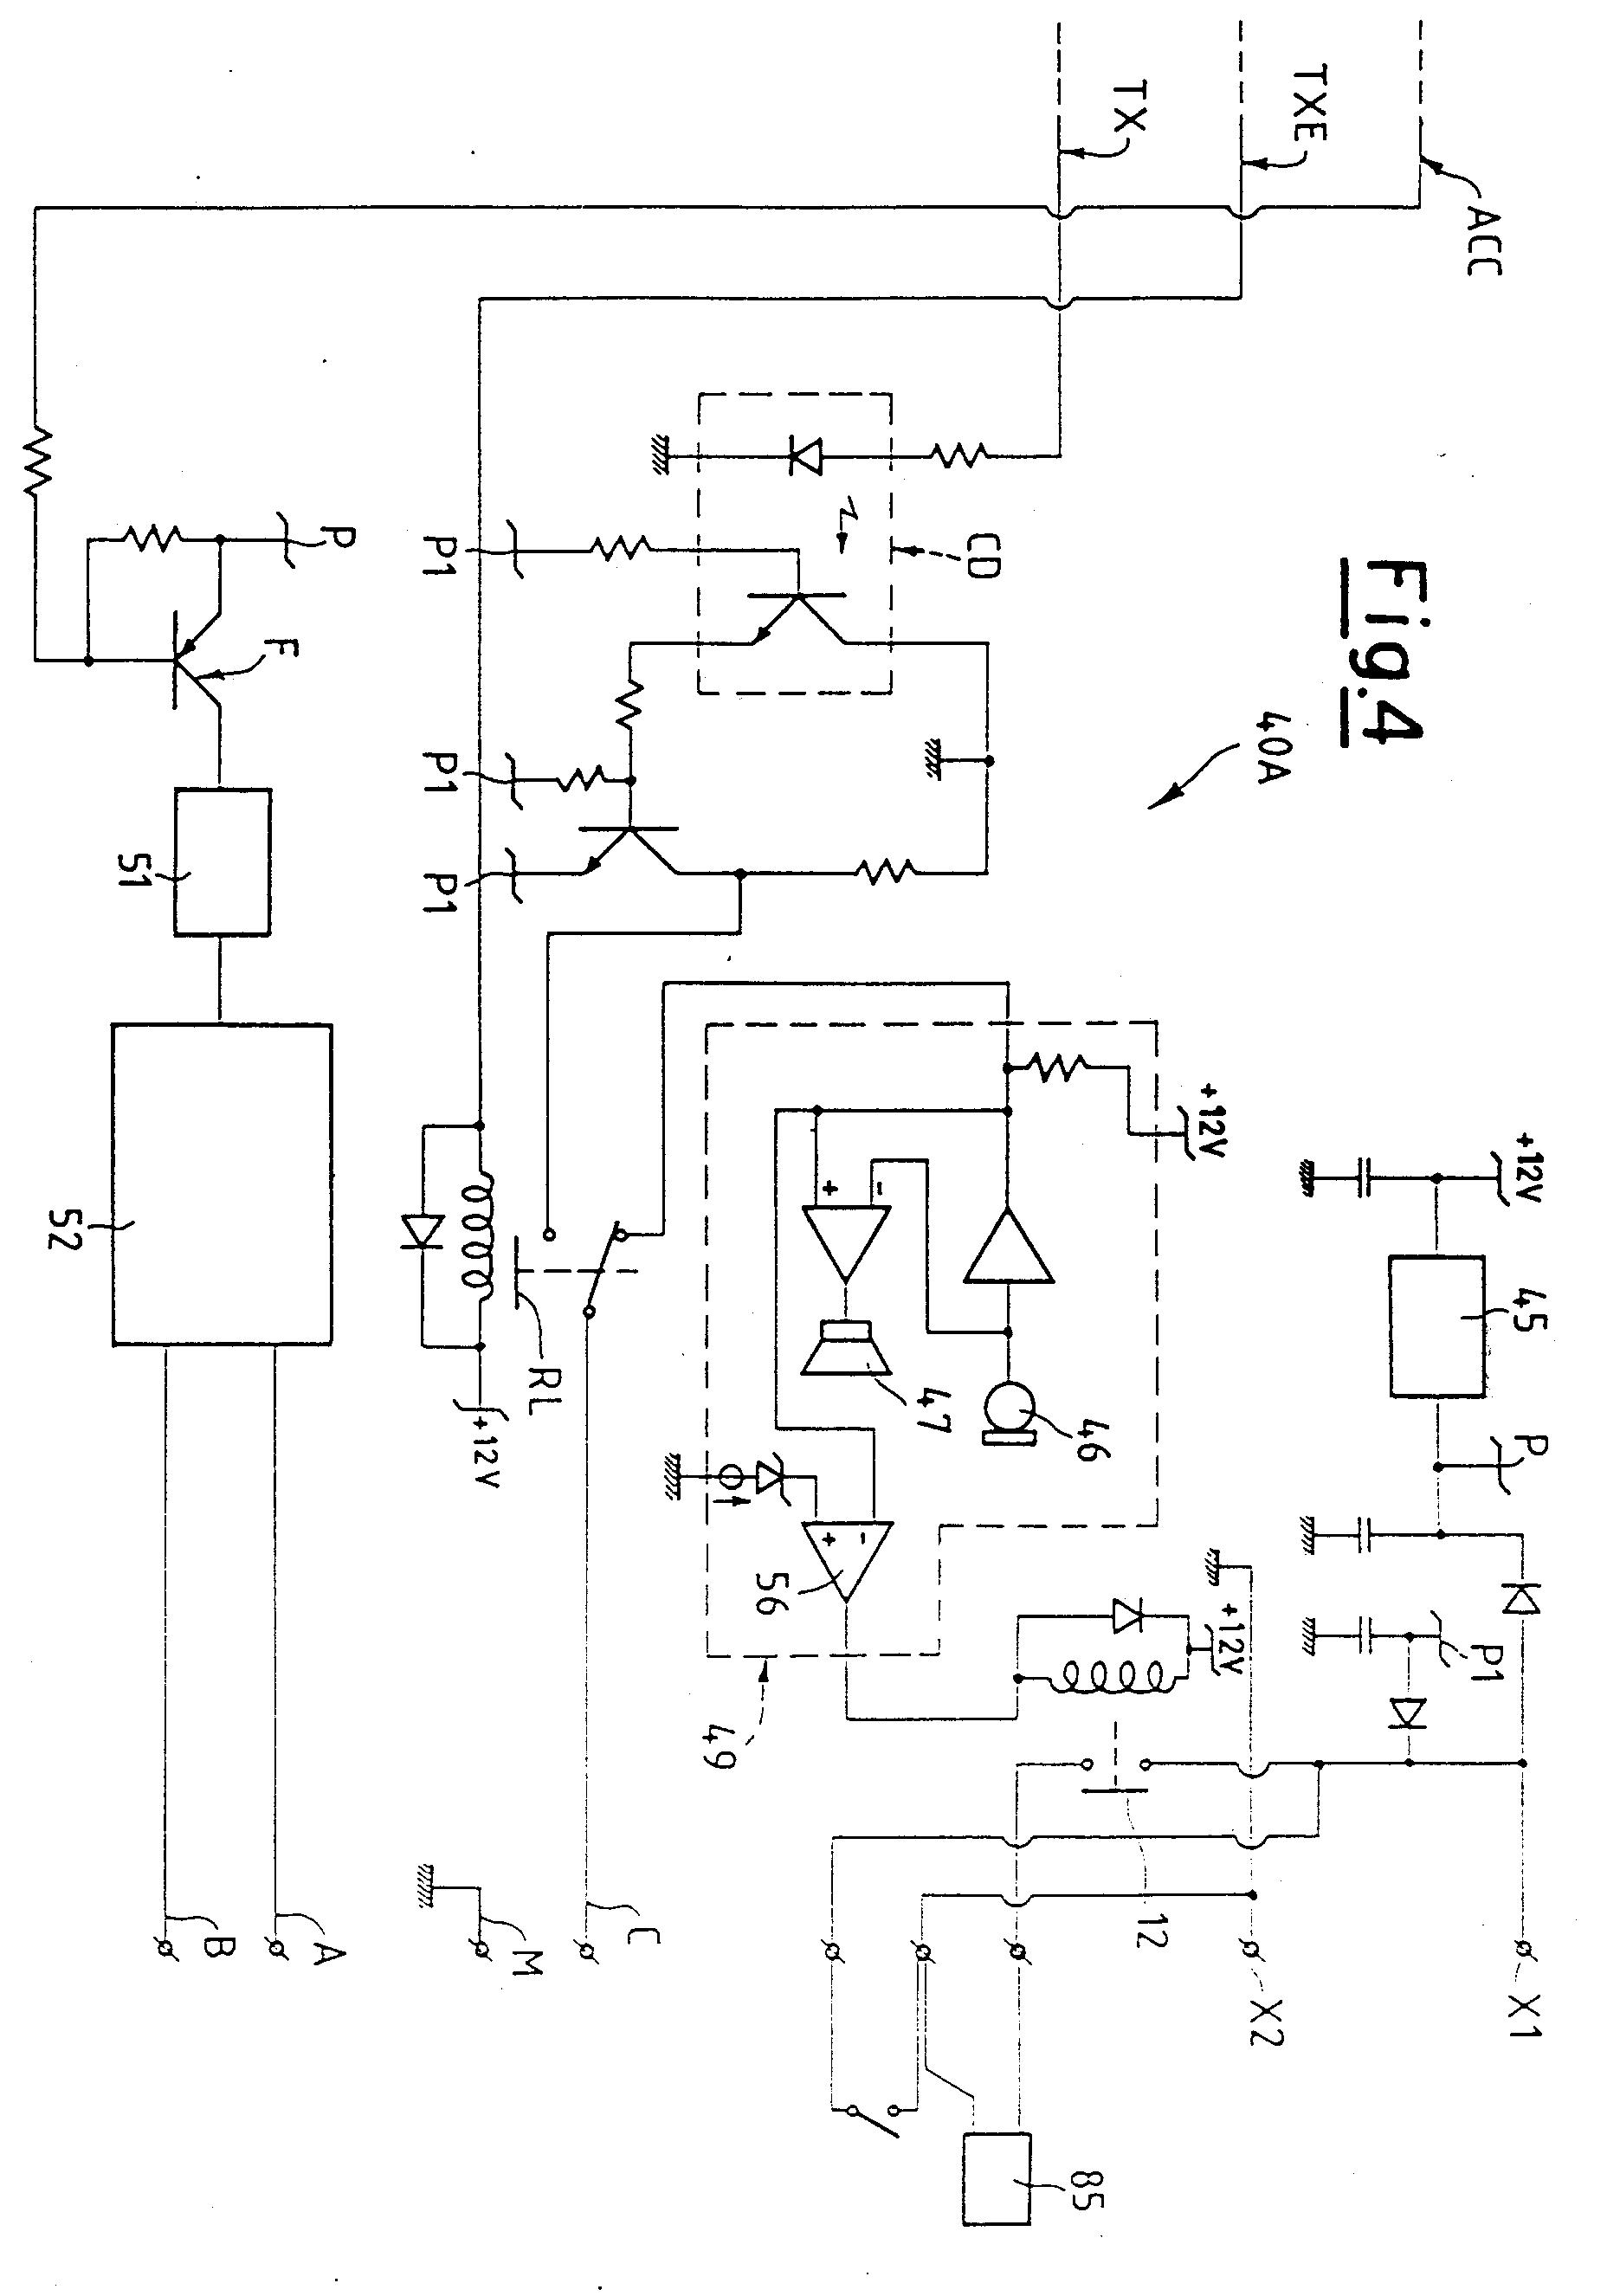 00130001 dmc1 wiring diagram doorbell wiring diagram, tektone wiring dmc1 wiring diagram at bayanpartner.co